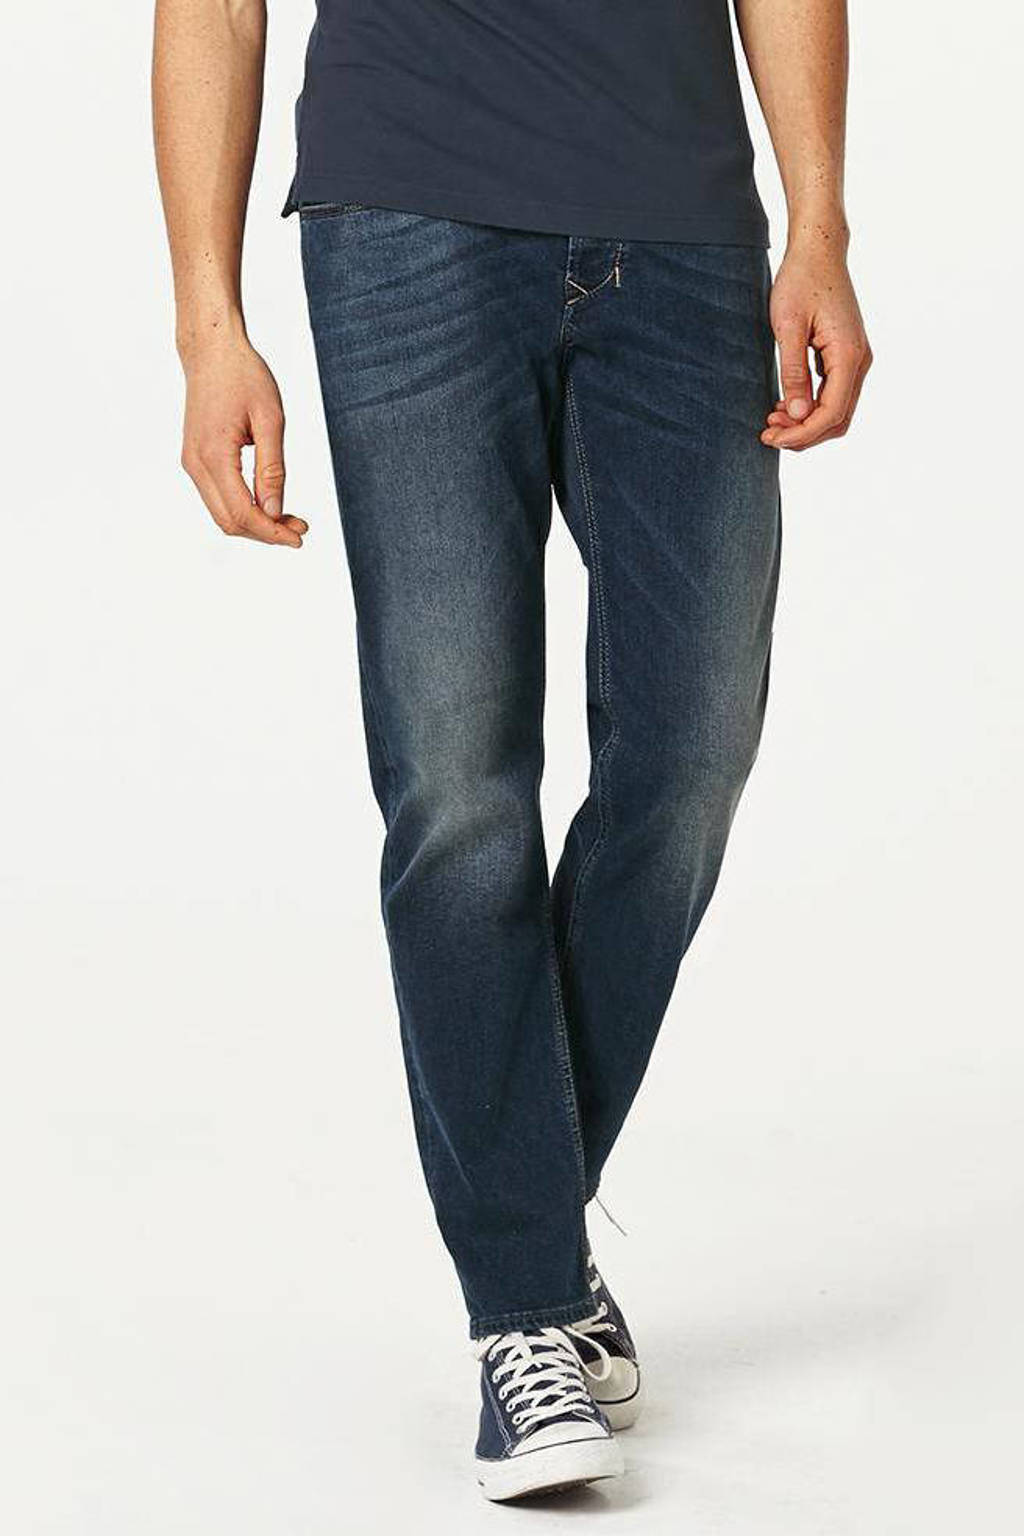 Diesel regular fit jeans Larkee-Beex, Donkerblauw